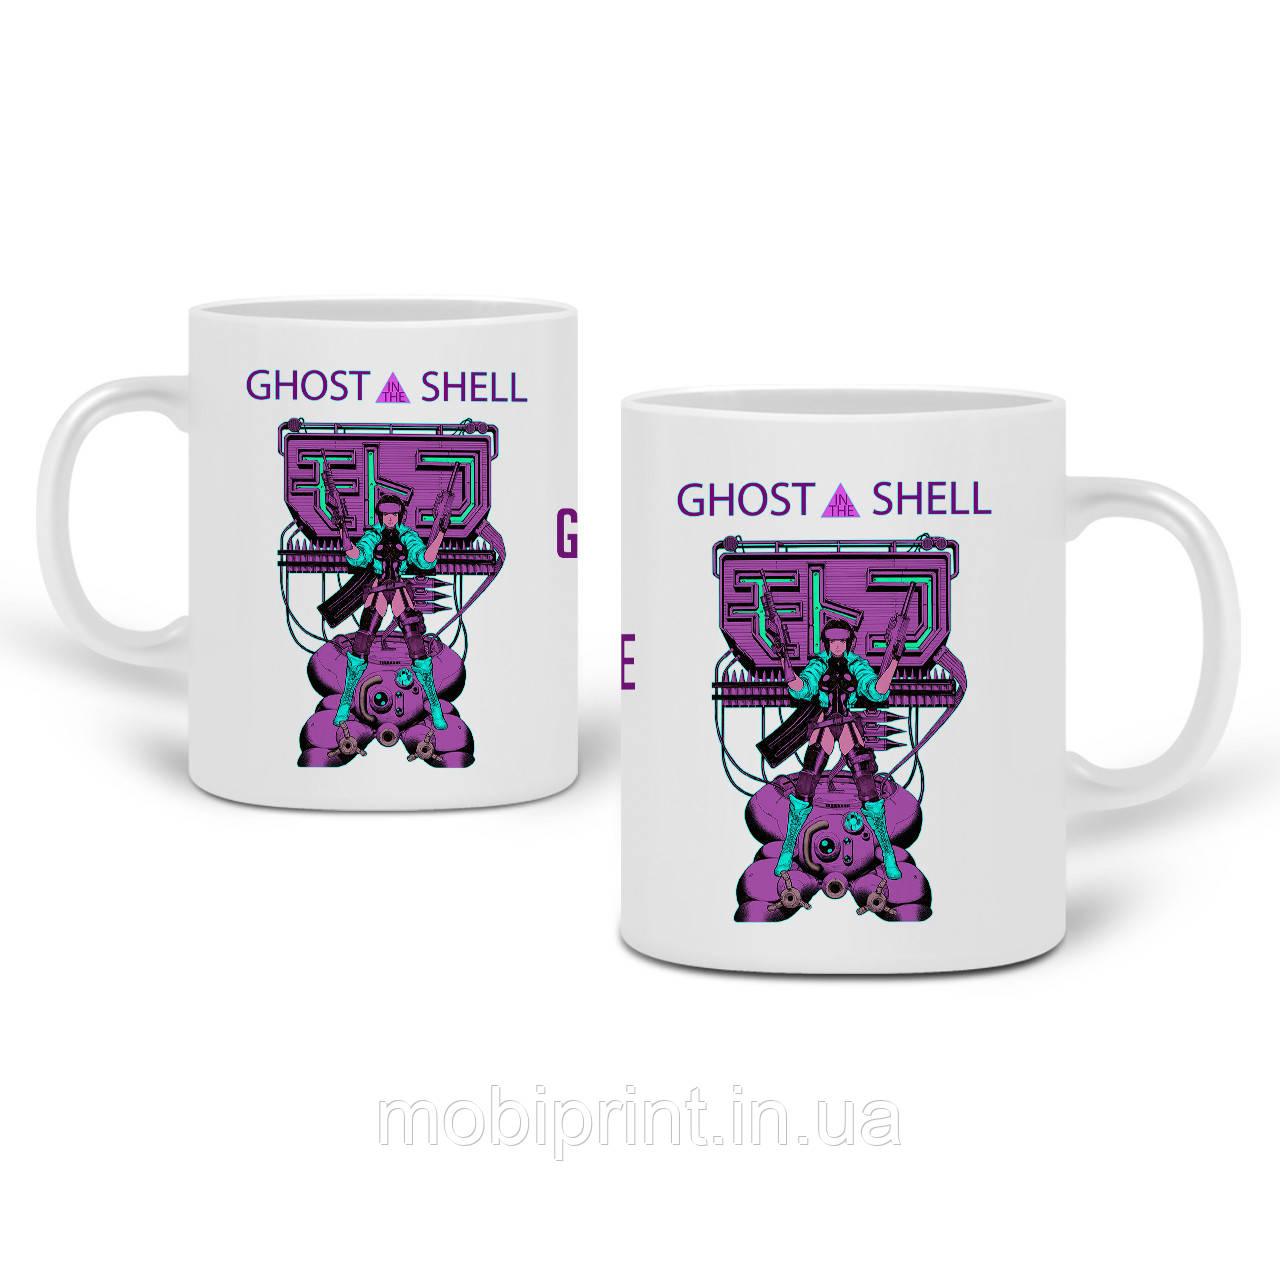 Кружка Мотоко Кусанаги Привид в обладунках (Ghost in the Shell) 330 мл Чашка Керамічна (20259-2652)